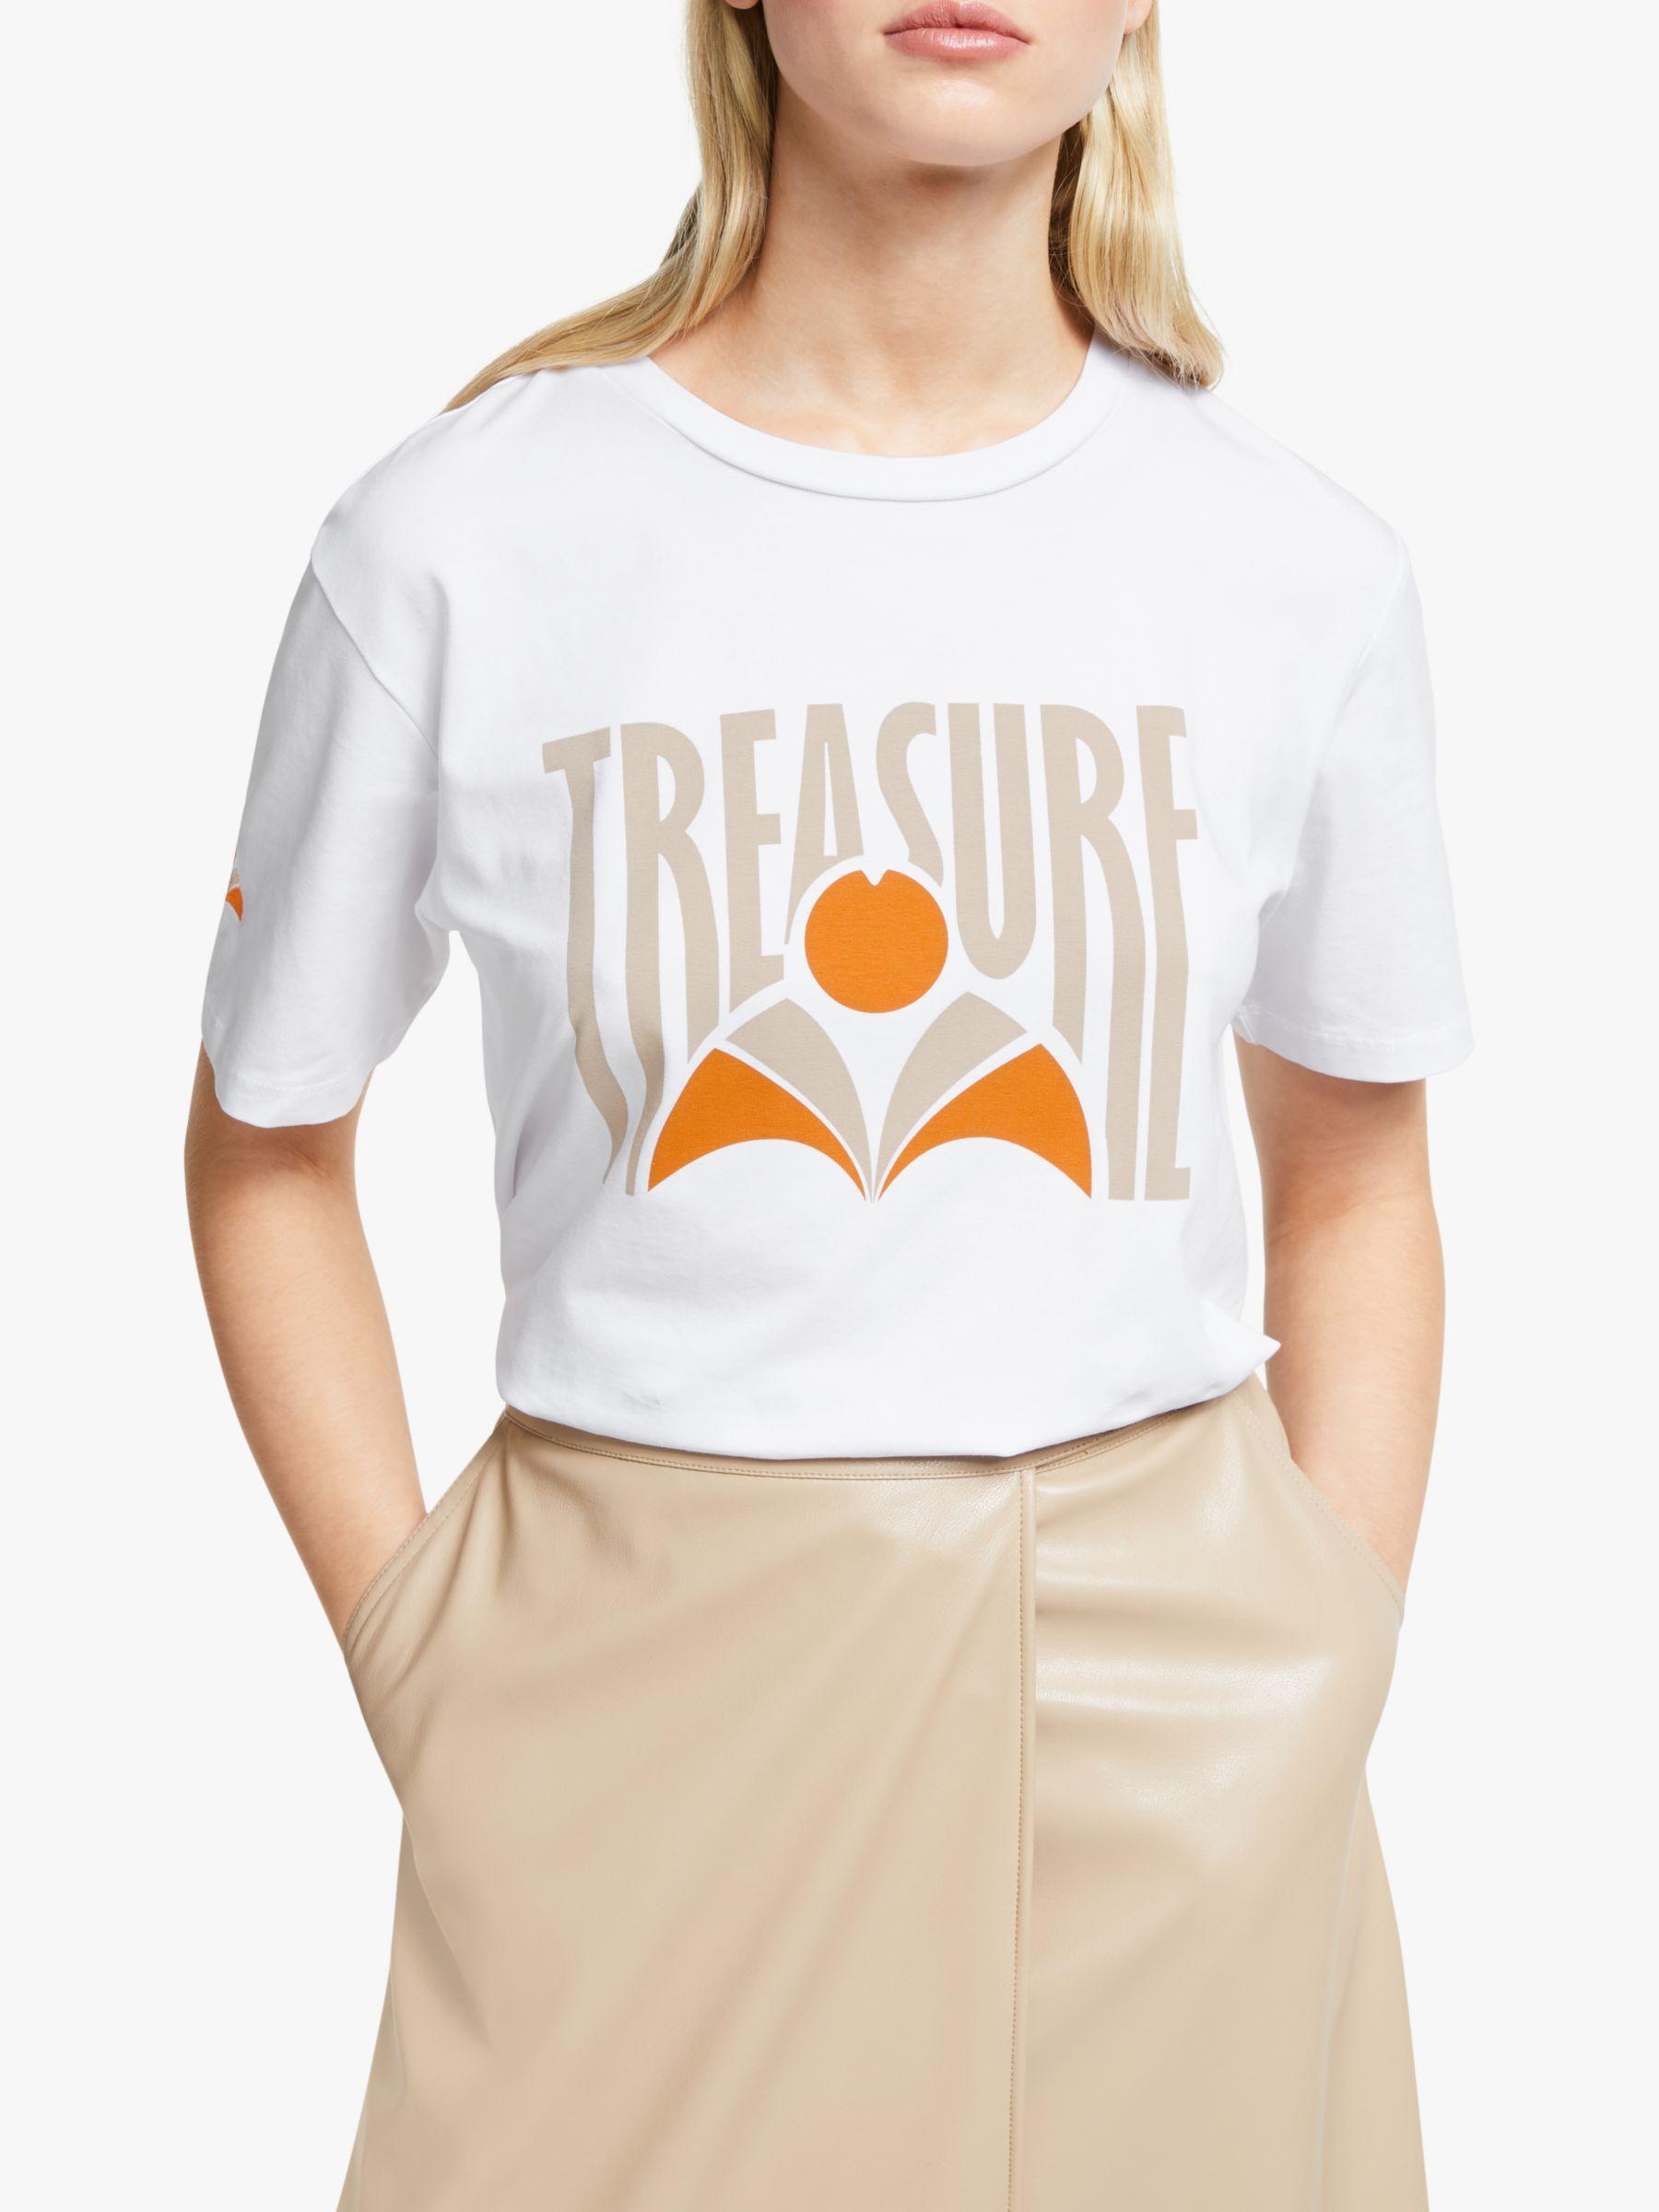 Gestuz Gestuz Treasure Print T-Shirt, Bright White